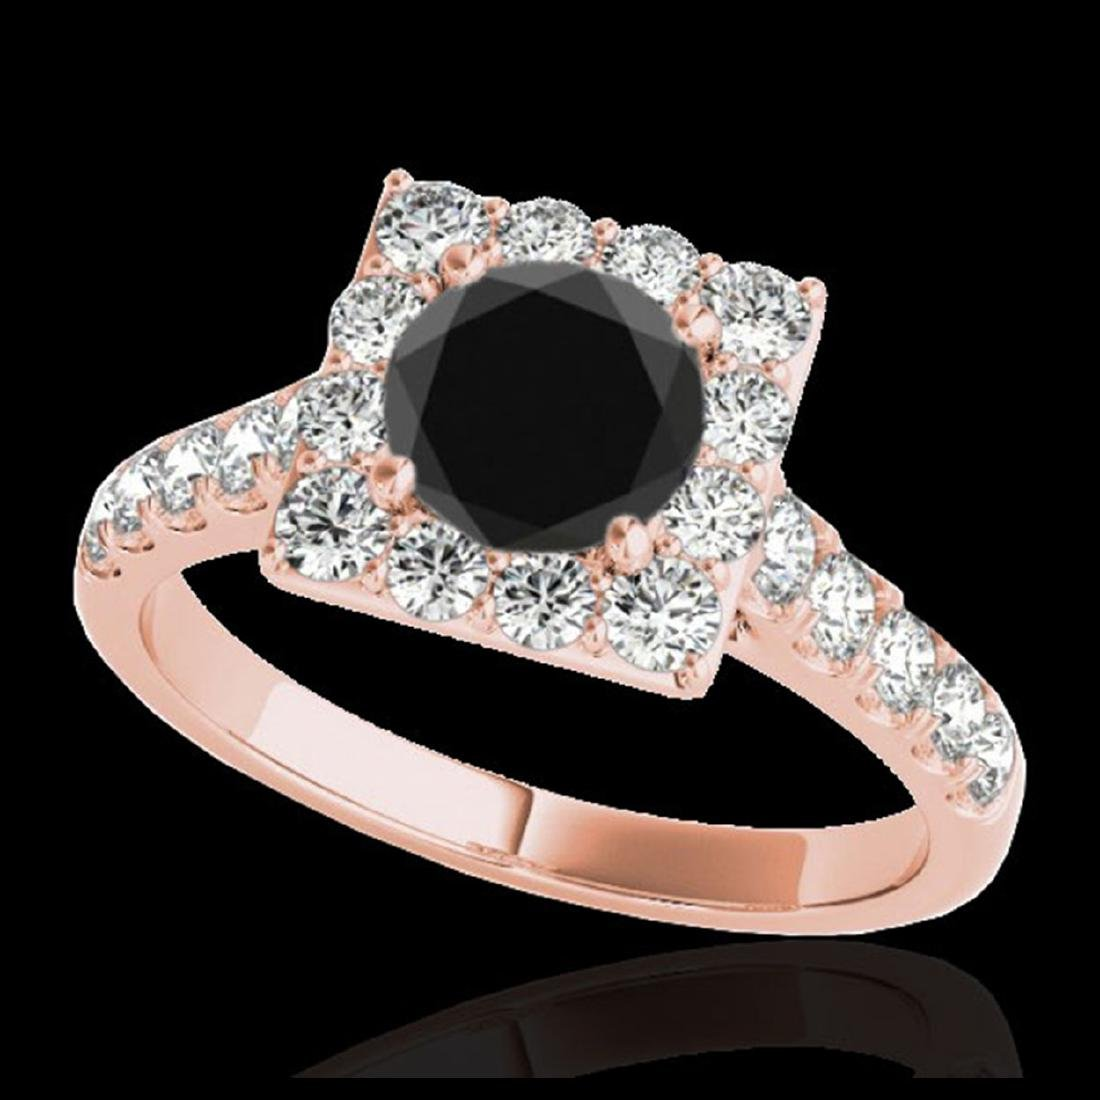 2.5 ctw VS Black Diamond Solitaire Halo Ring 10K Rose